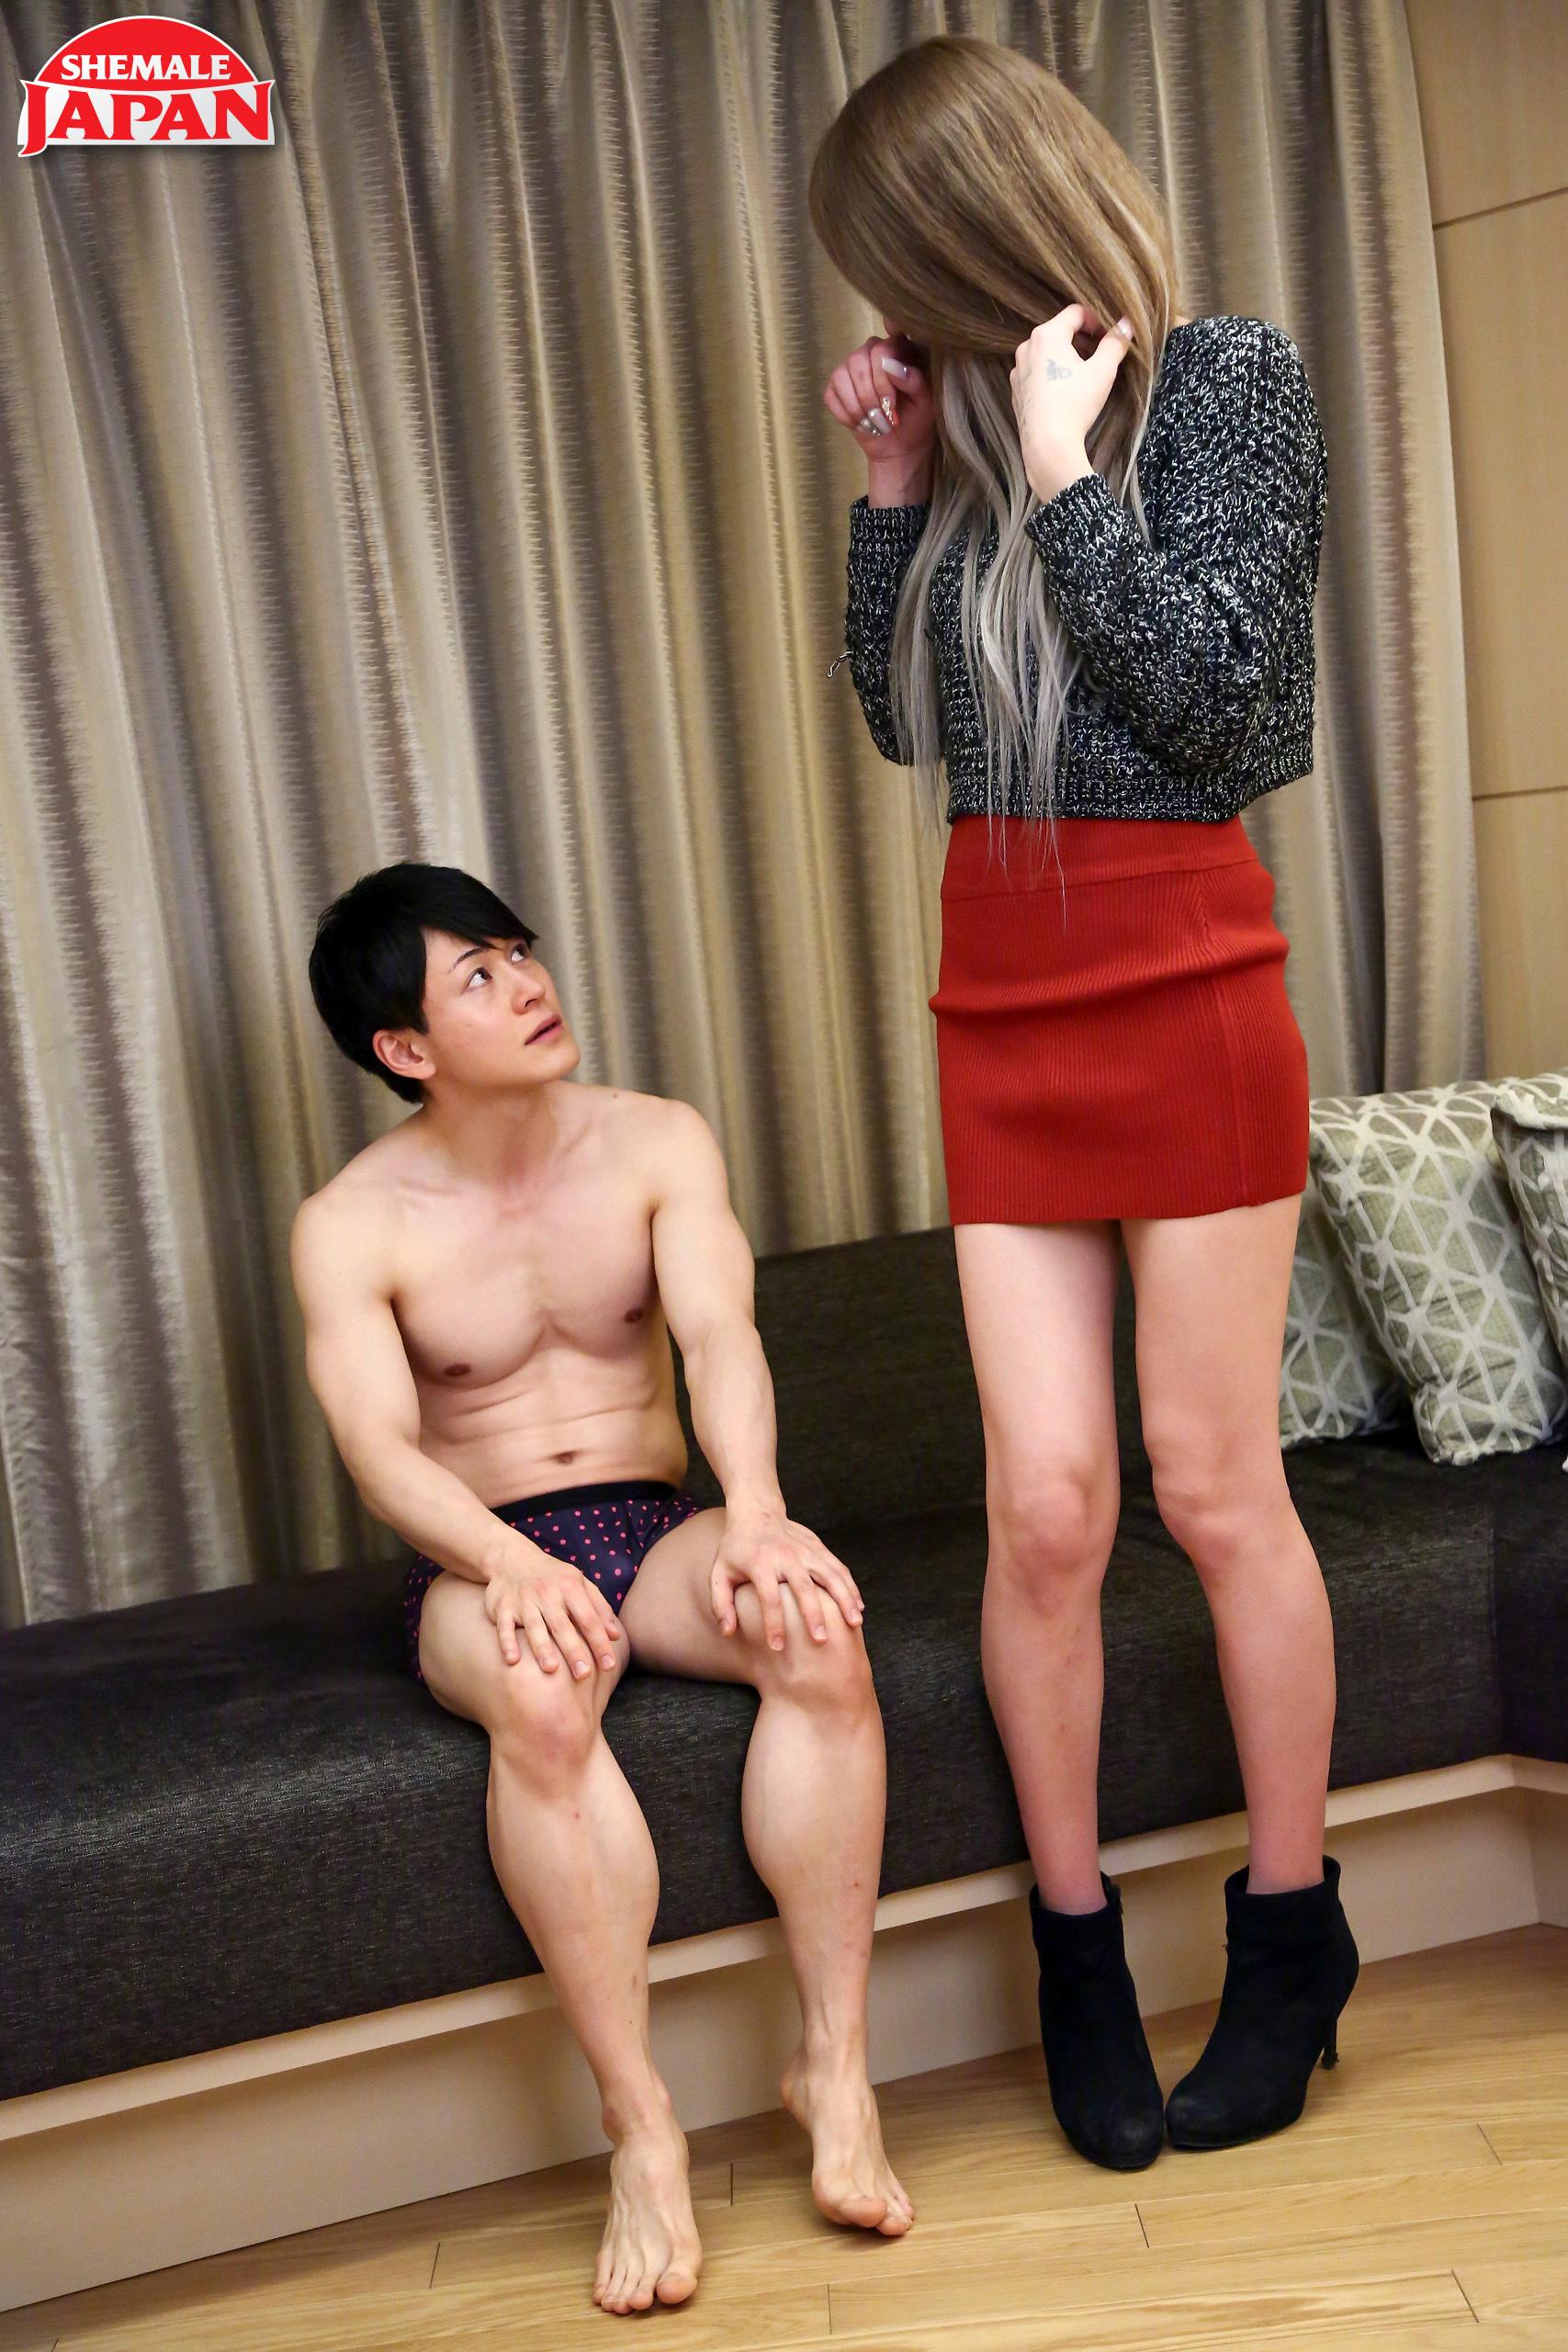 Meika Kuroki Gets Her Butt Pounded!